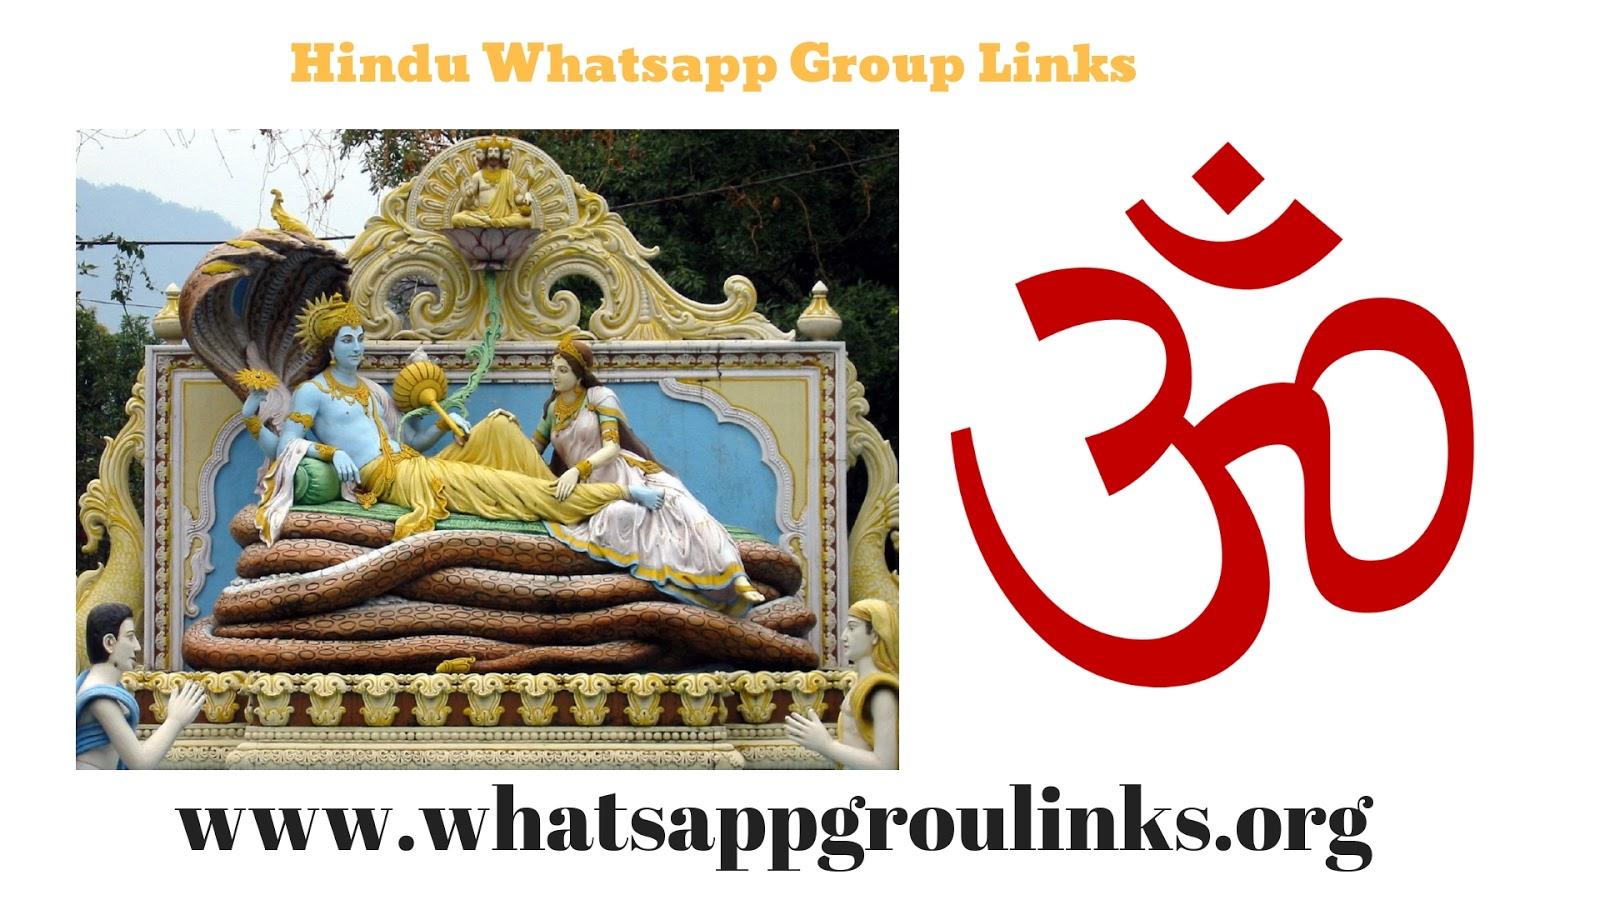 JOIN HINDU WHATSAPP GROUP LINKS LIST - Whatsapp Group Links